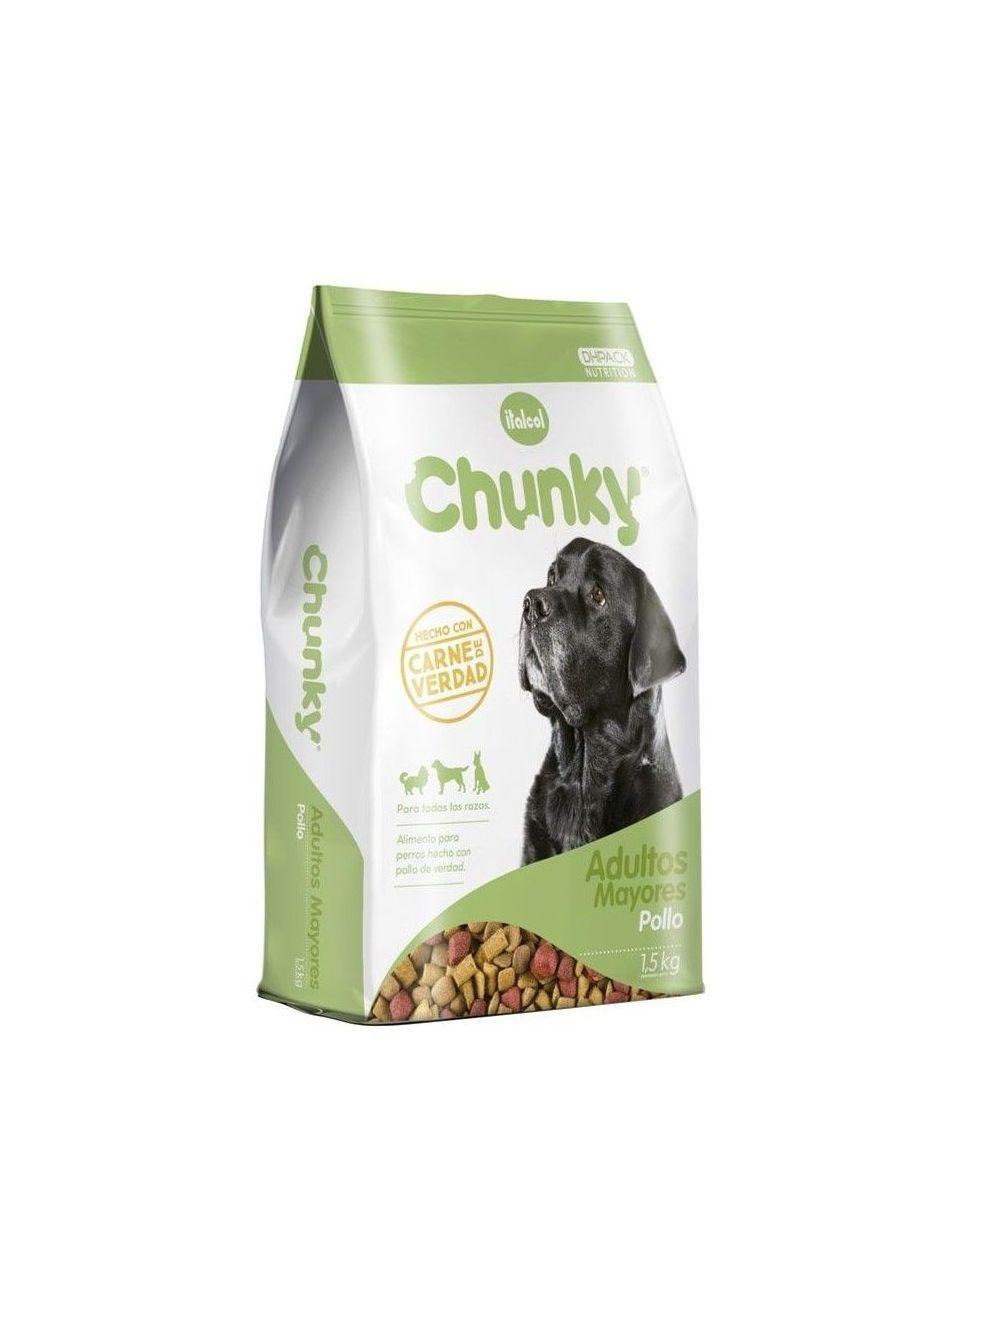 Chunky adultos mayores 1.5 kilos